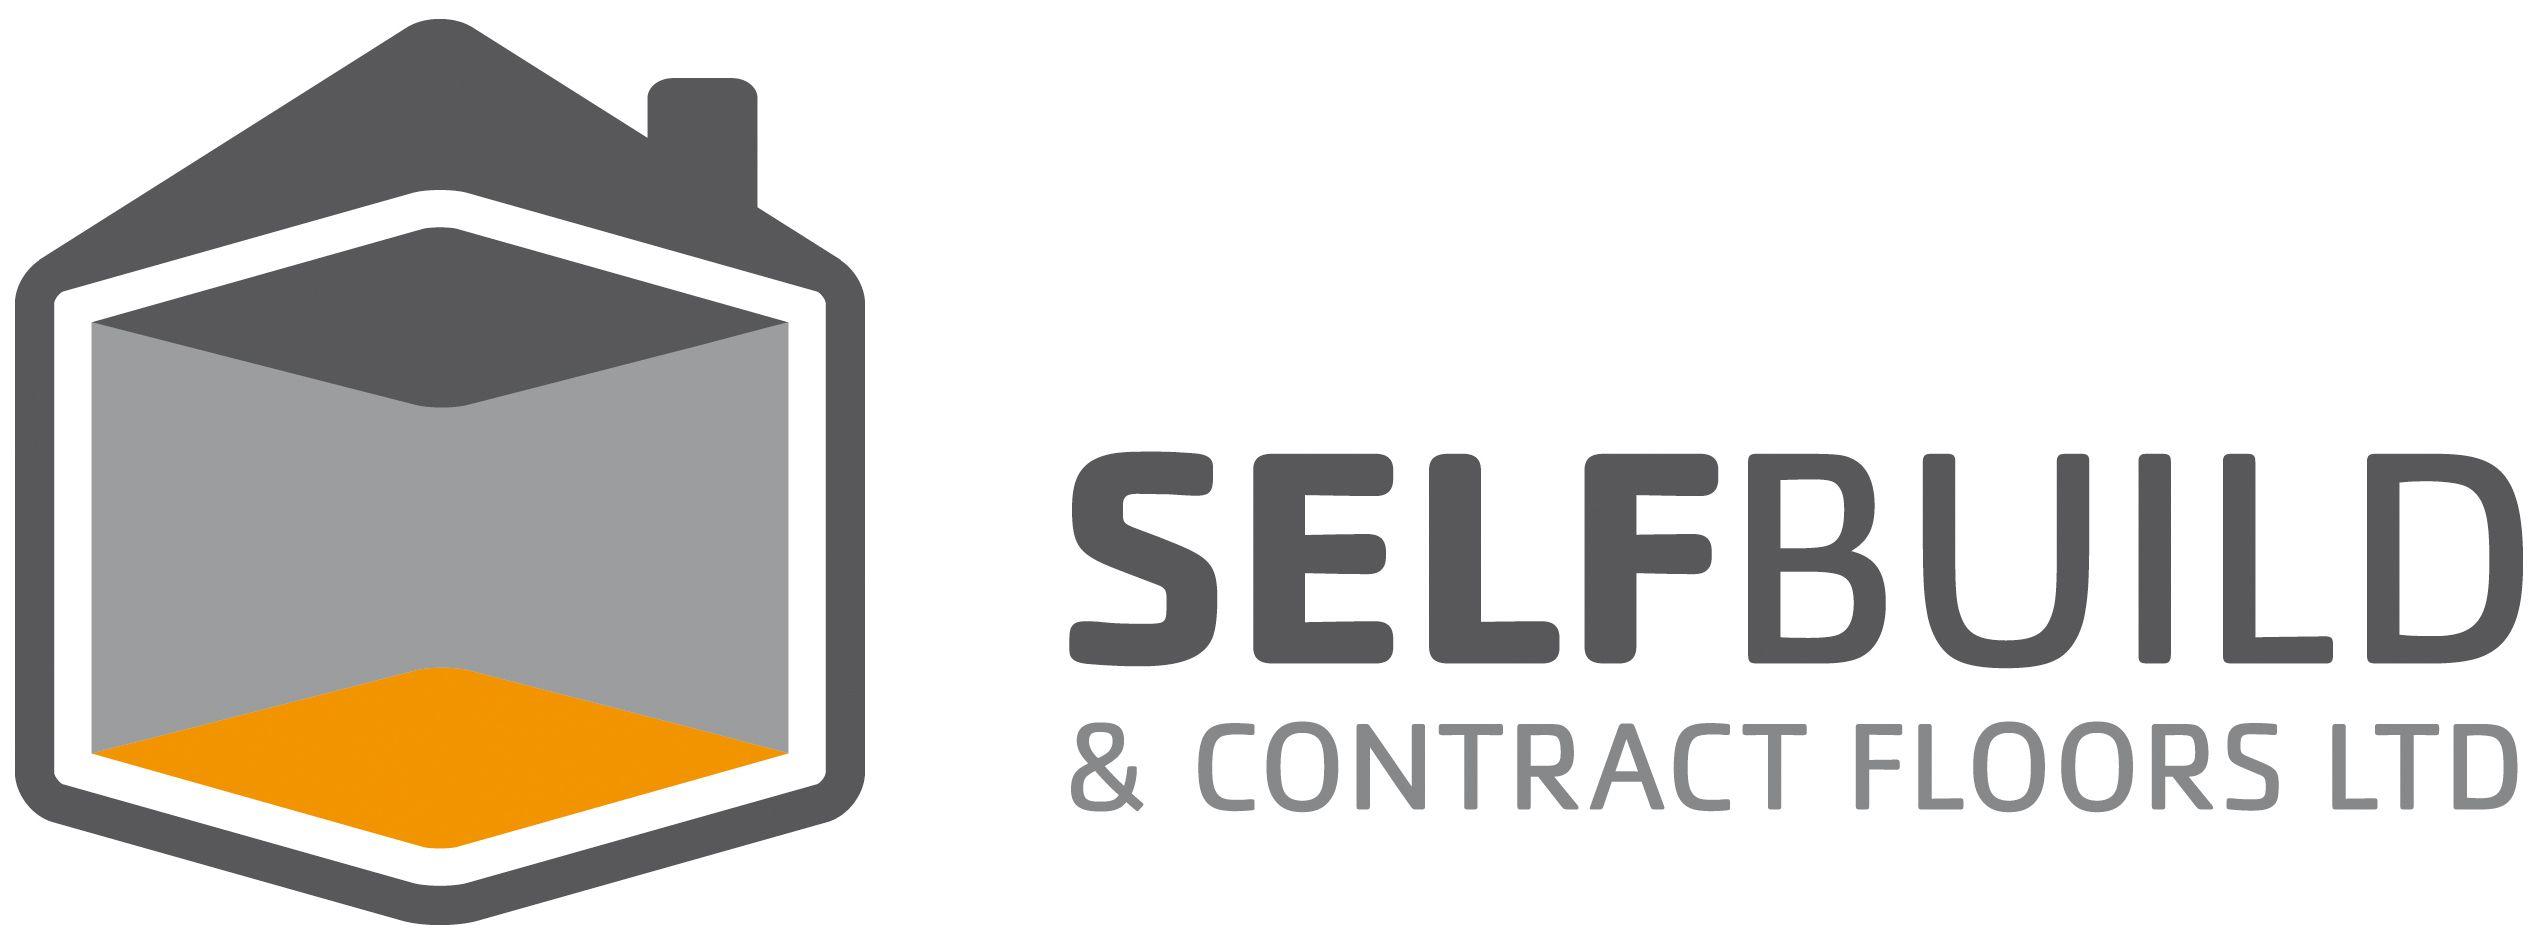 Selfbuild & Contract Floors